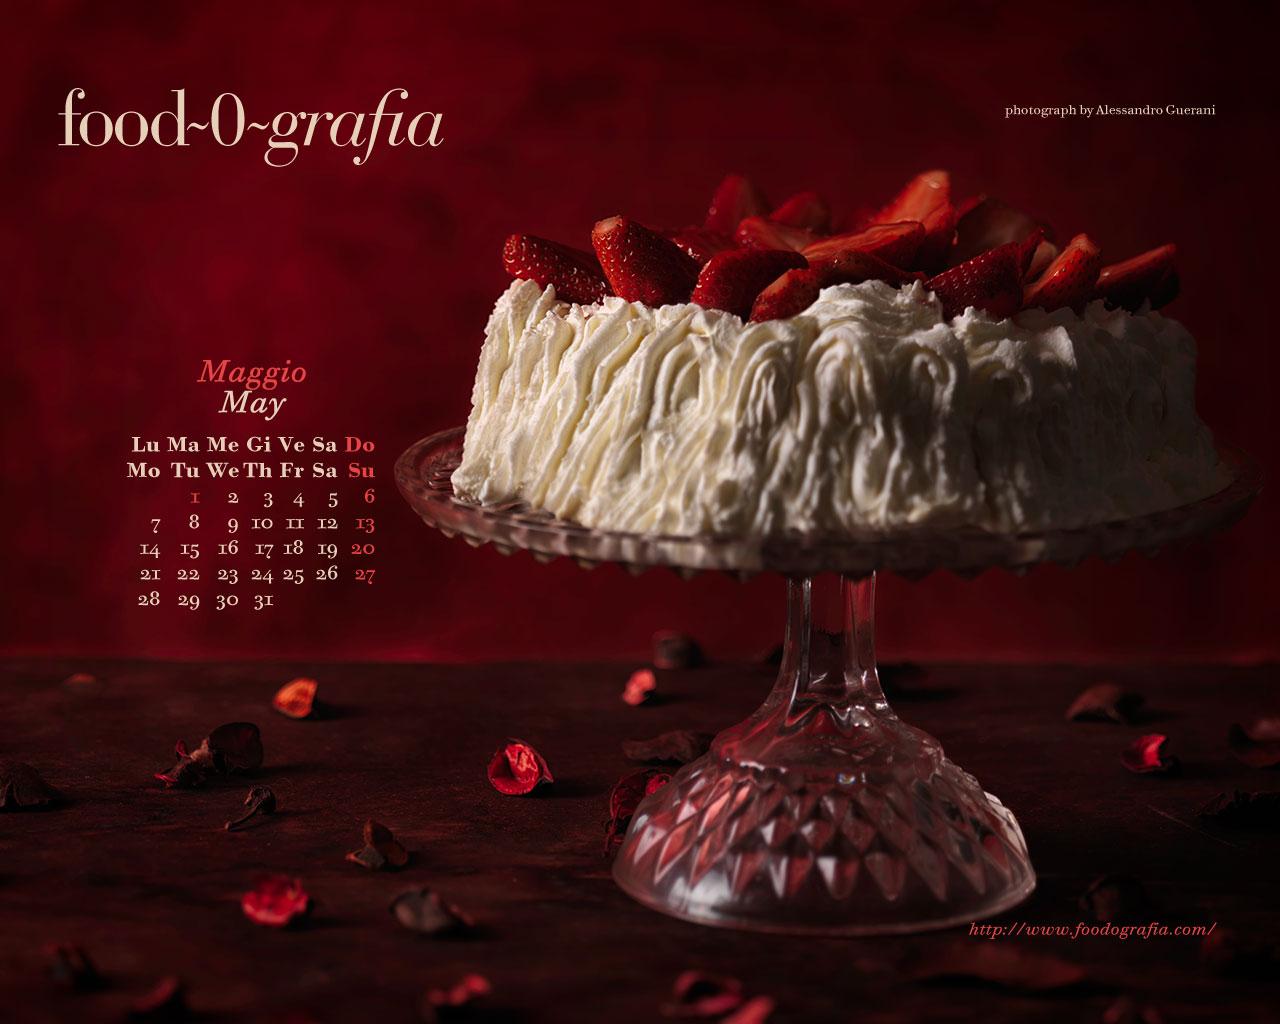 http://www.alessandroguerani.com/foto_blog/foodografia-calendar-may-2012-1280x1024.jpg